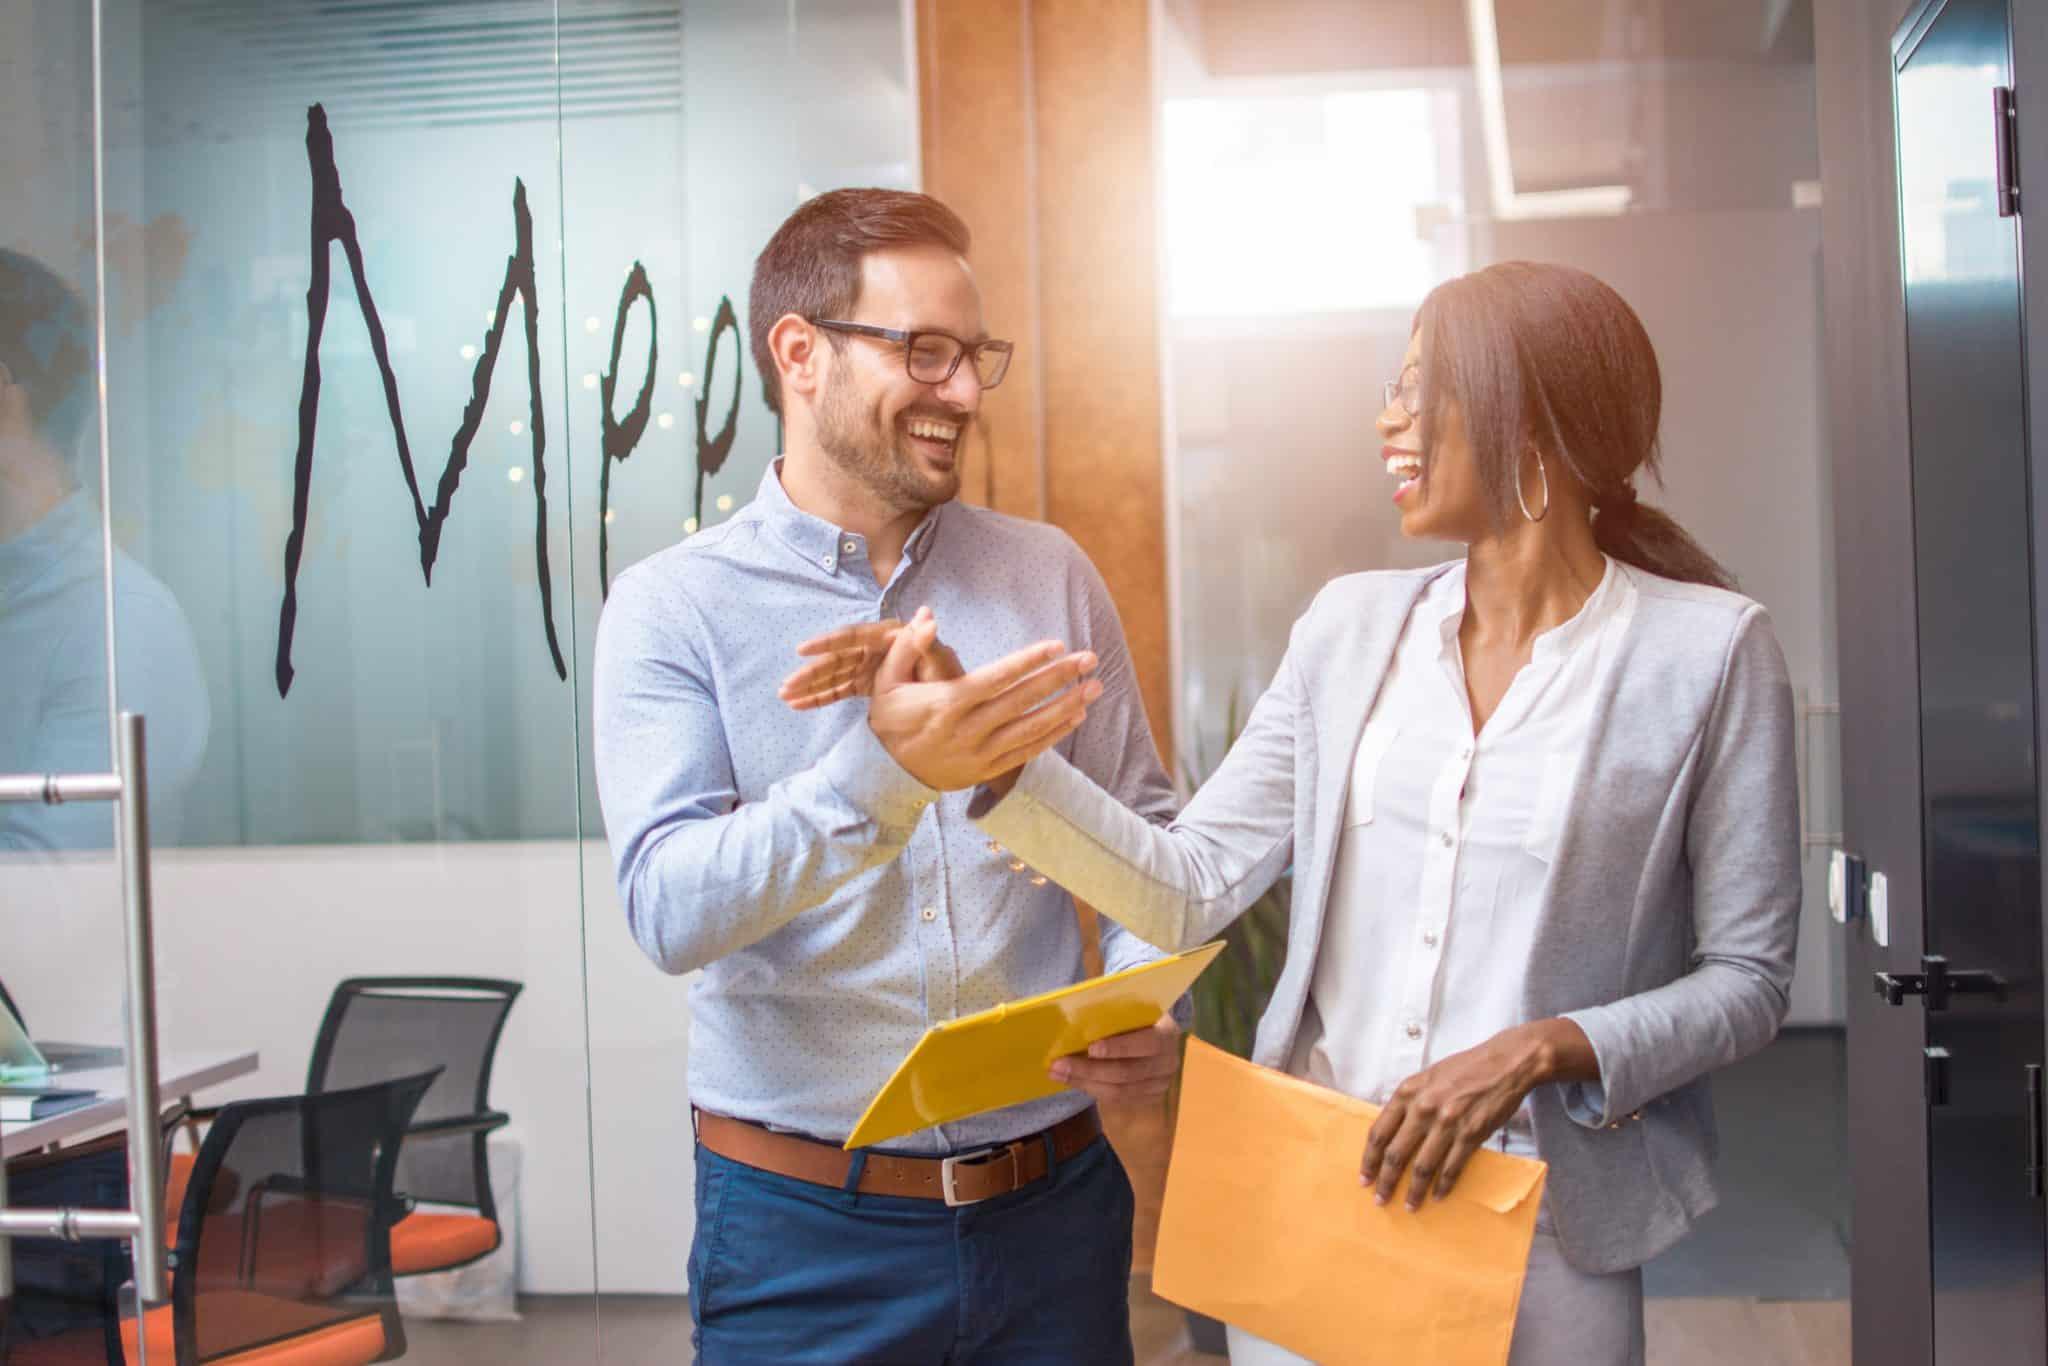 Aufbauseminar Office Manager - S&P Seminar für Assistenten